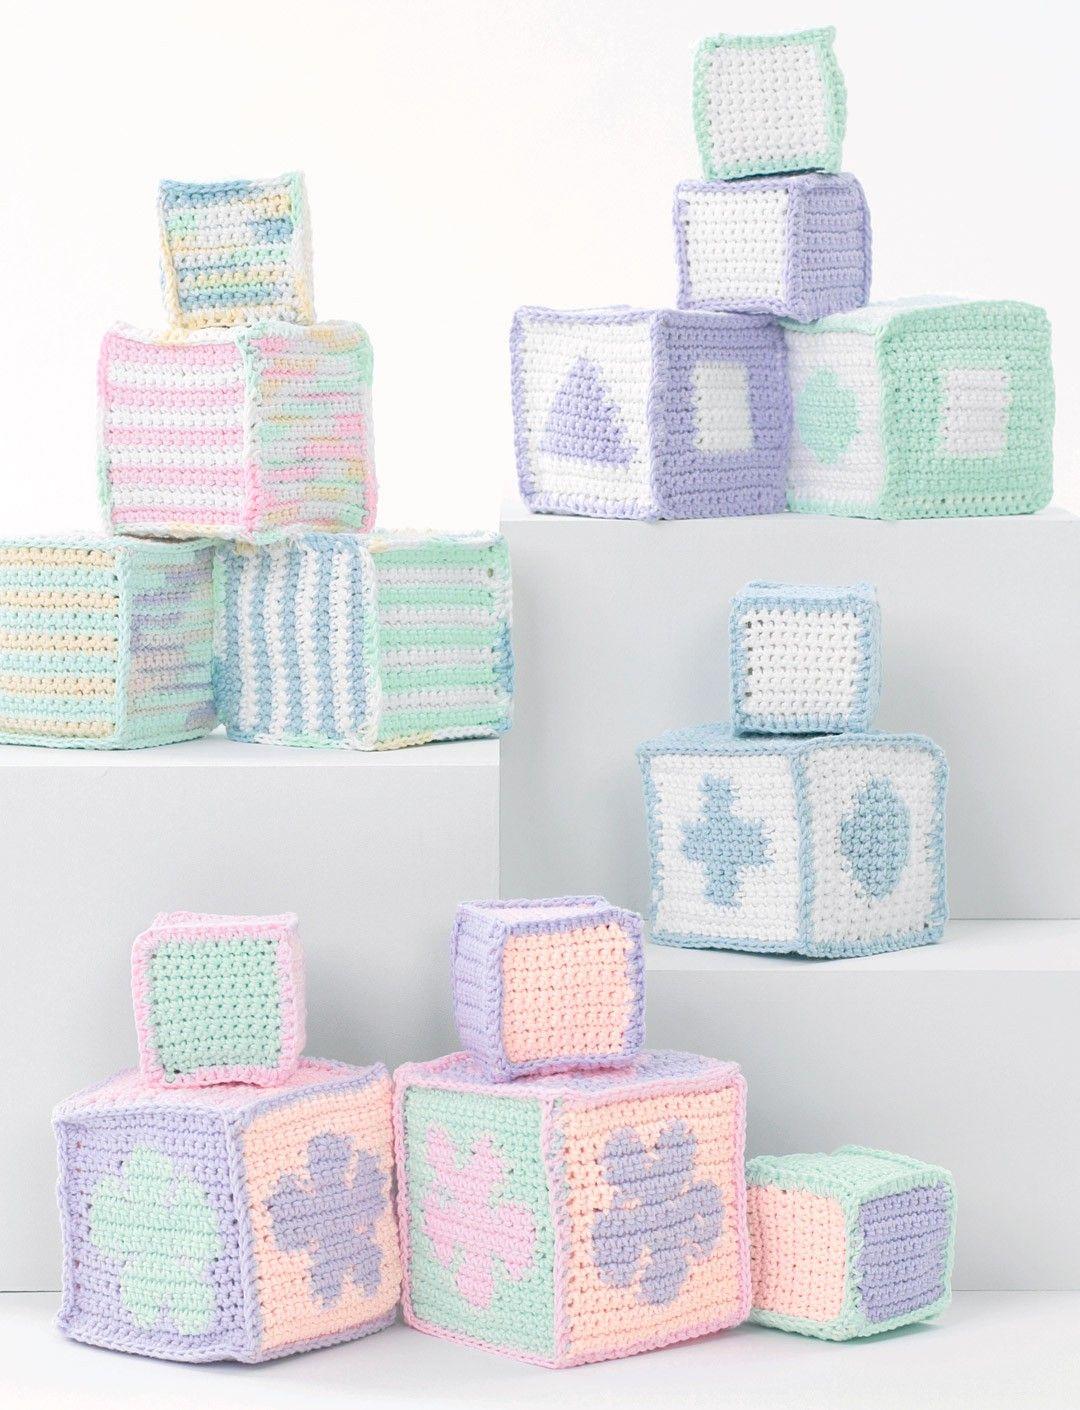 Yarnspirations.com - Lily Baby's Blocks - Patterns  | Yarnspirations